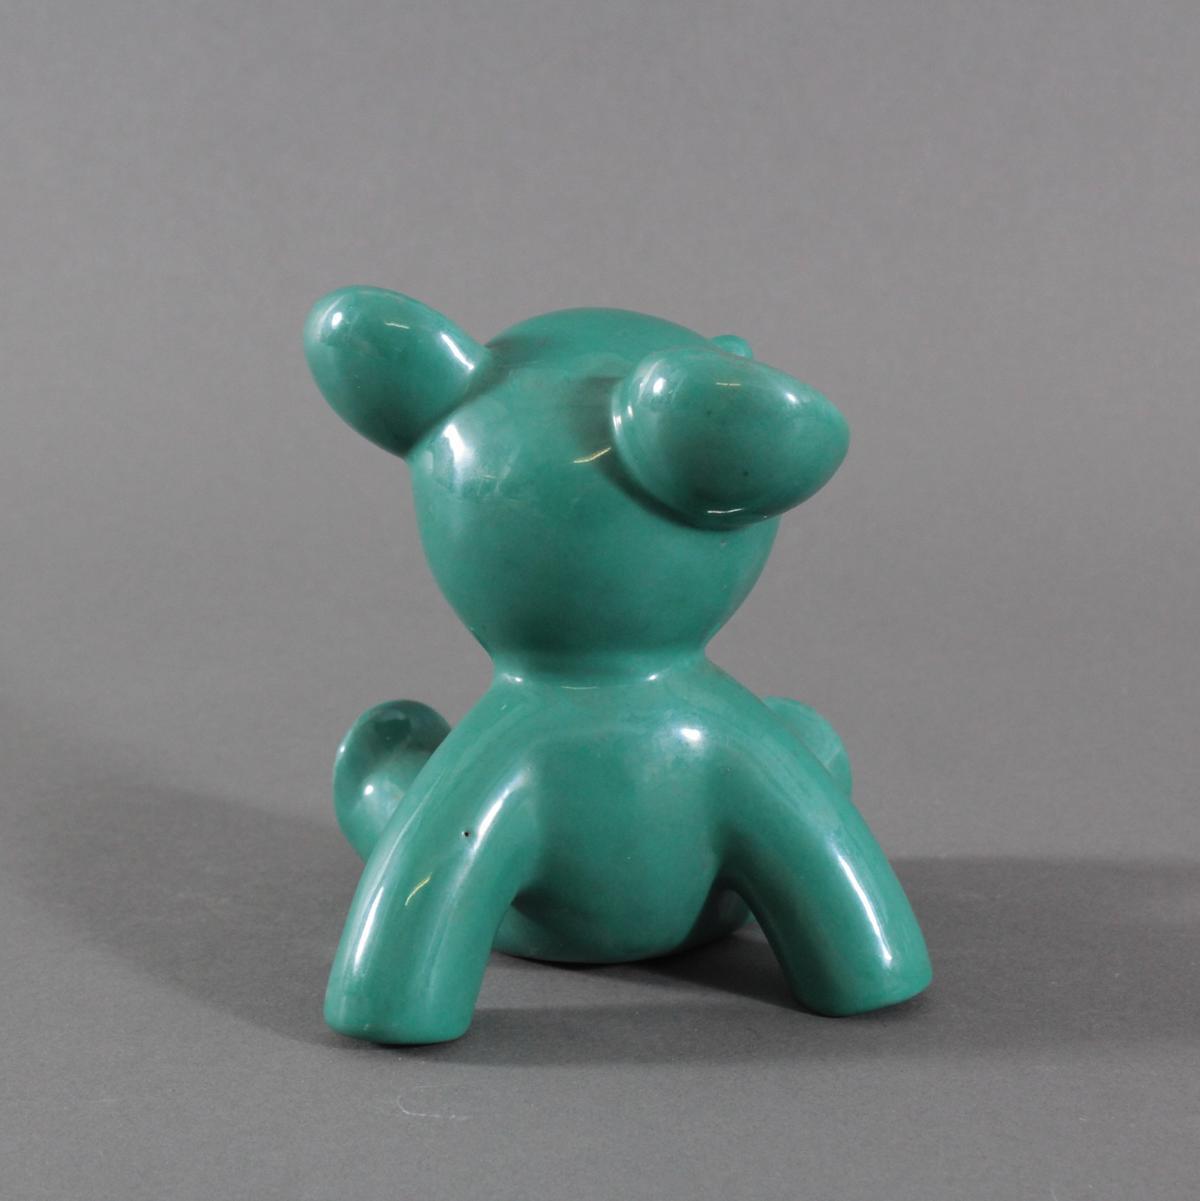 Keramik-Miniaturtierplastik, 'Bär', Karlsruher Majolika, um 1956-88, Entw.: Walter Bosse-4